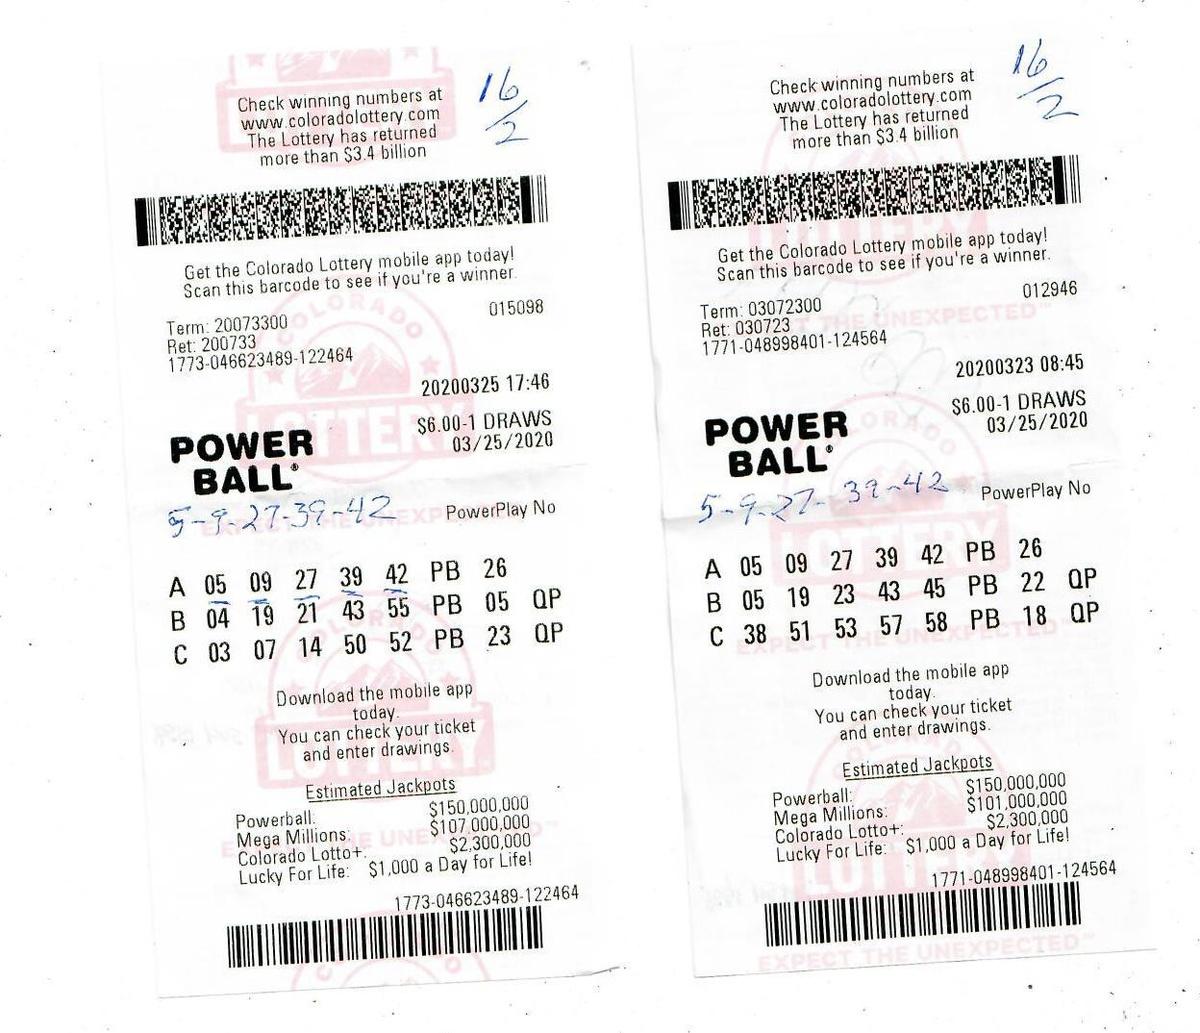 Les tickets gagnants Powerball